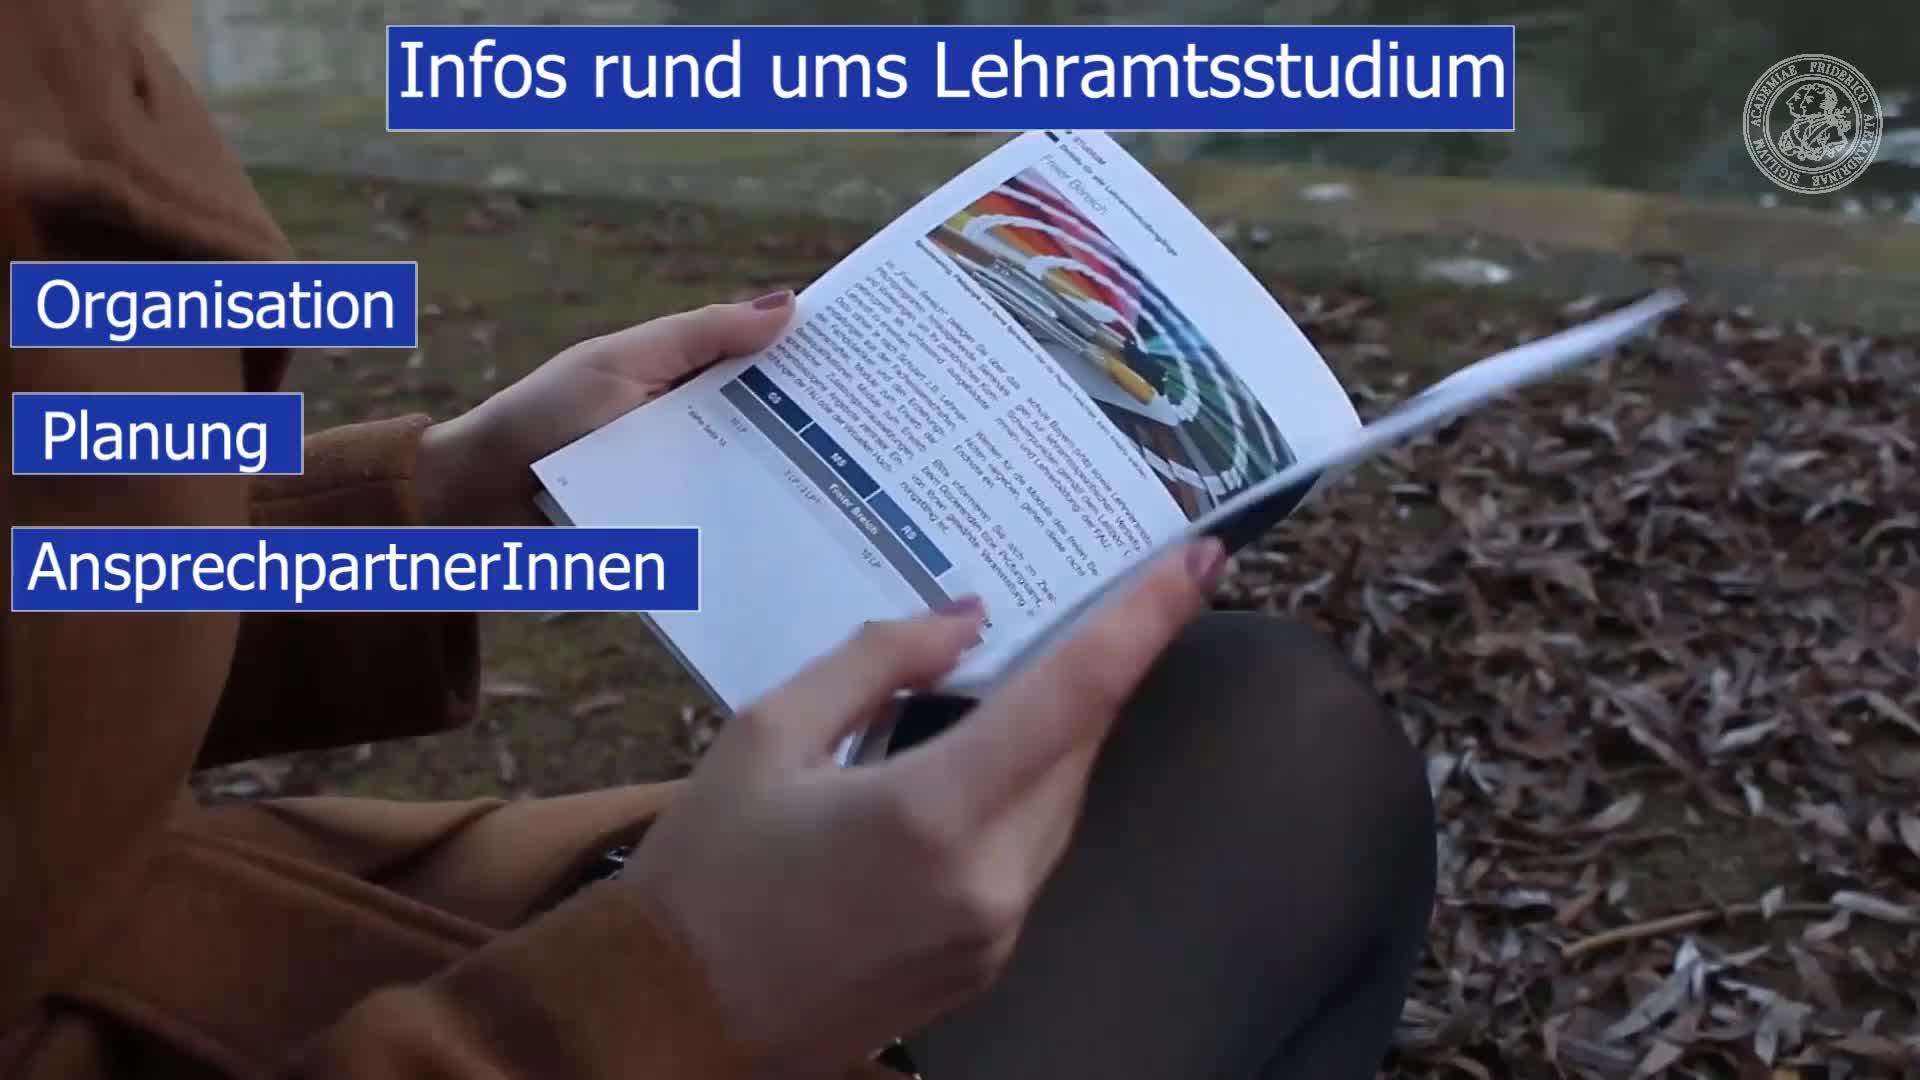 Lehramt   Gymnasium   Realschule   Stundenplan I   ZfL preview image